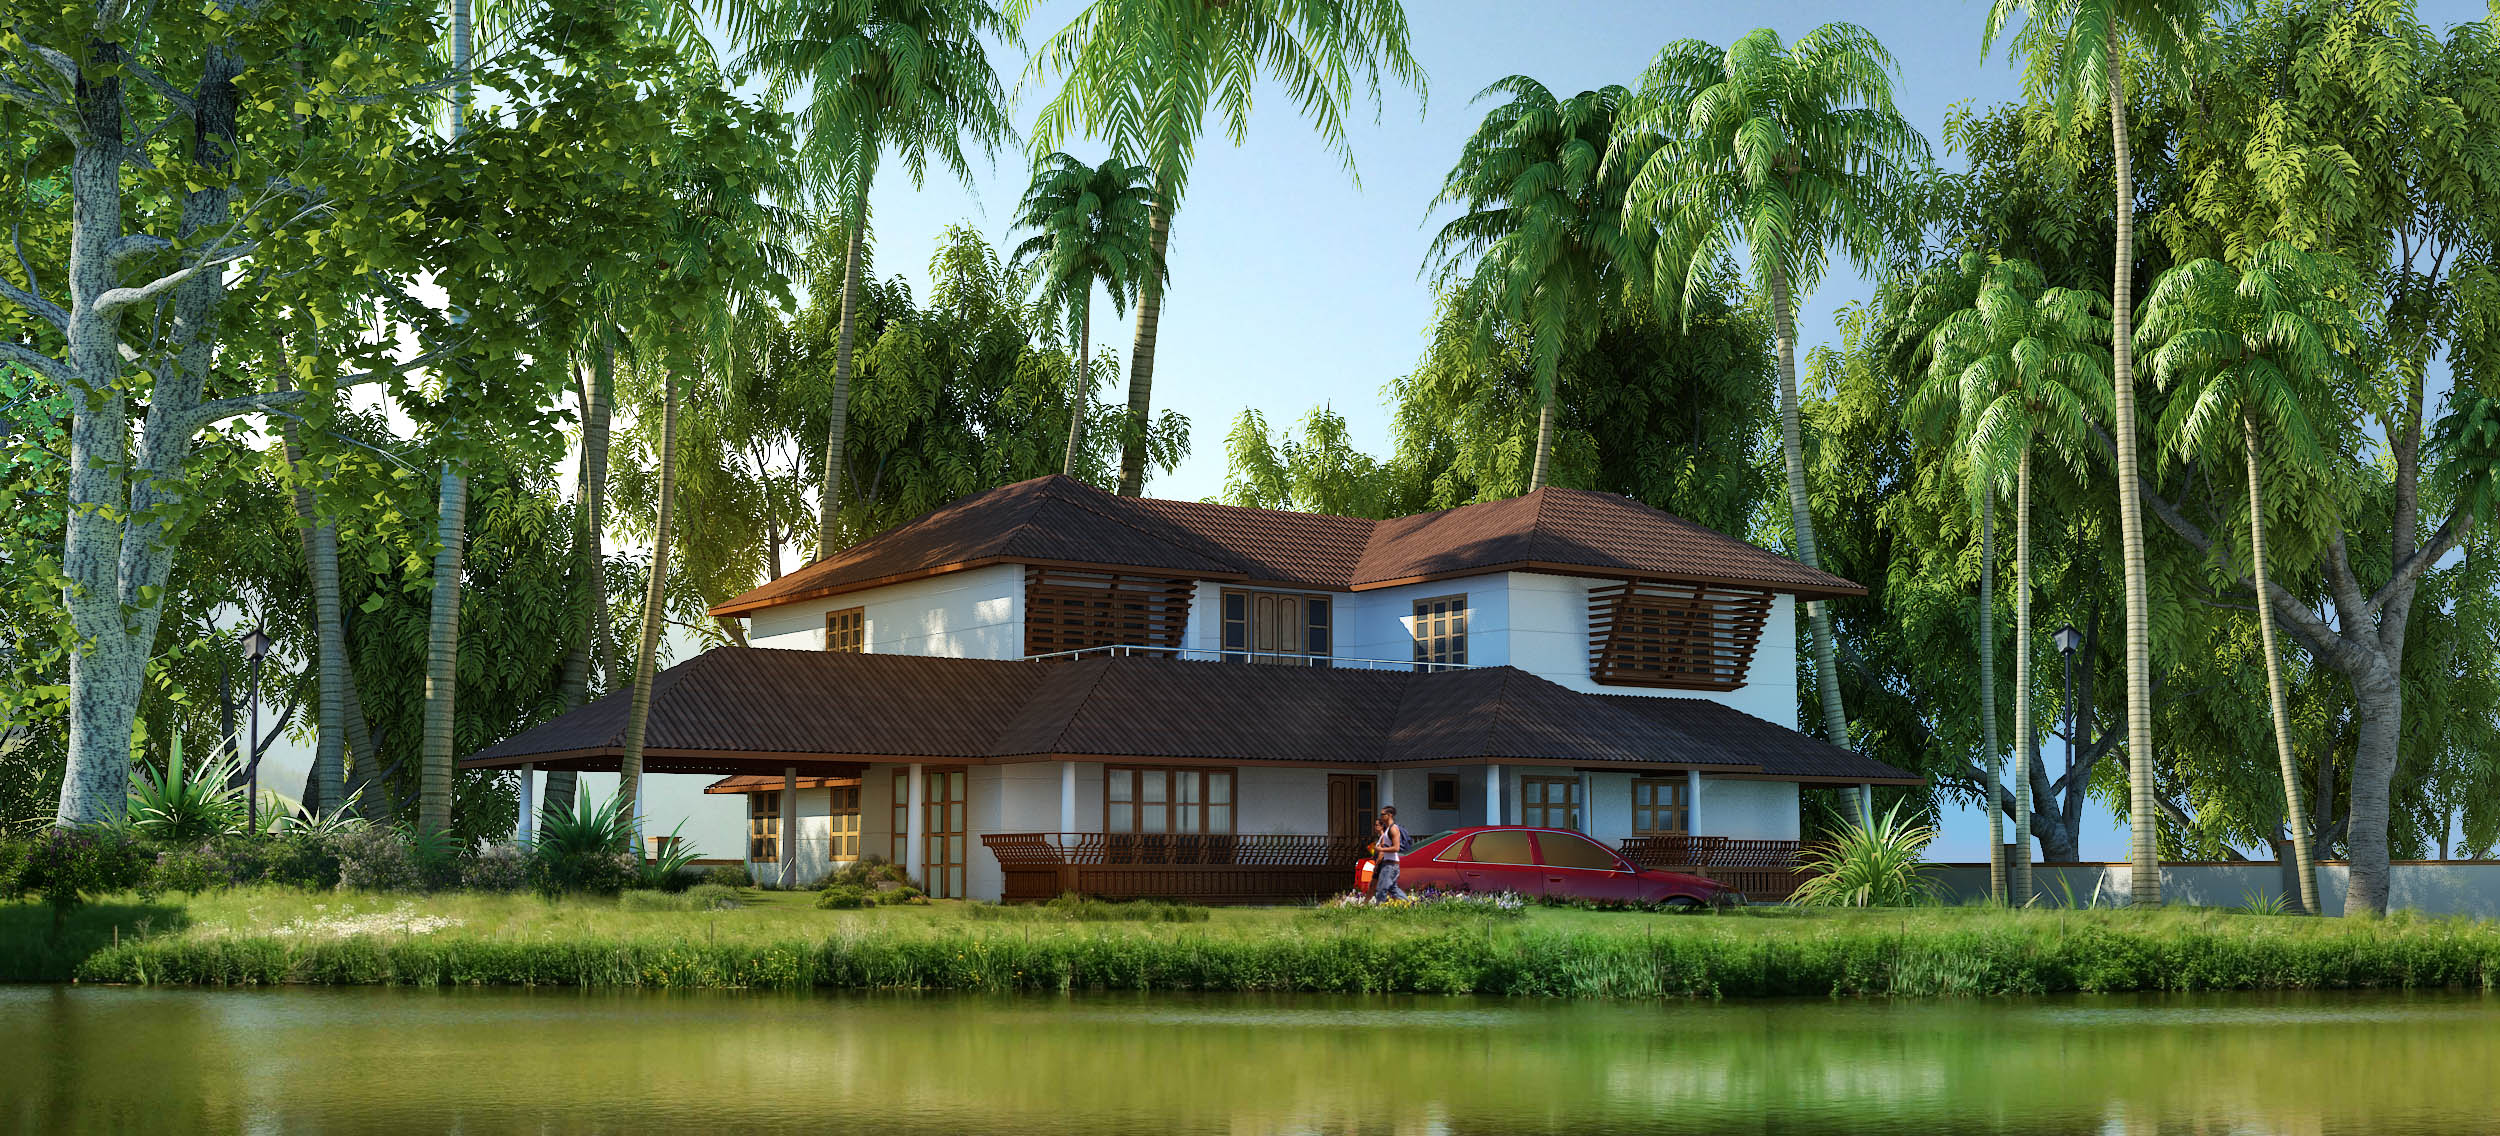 Kerala type